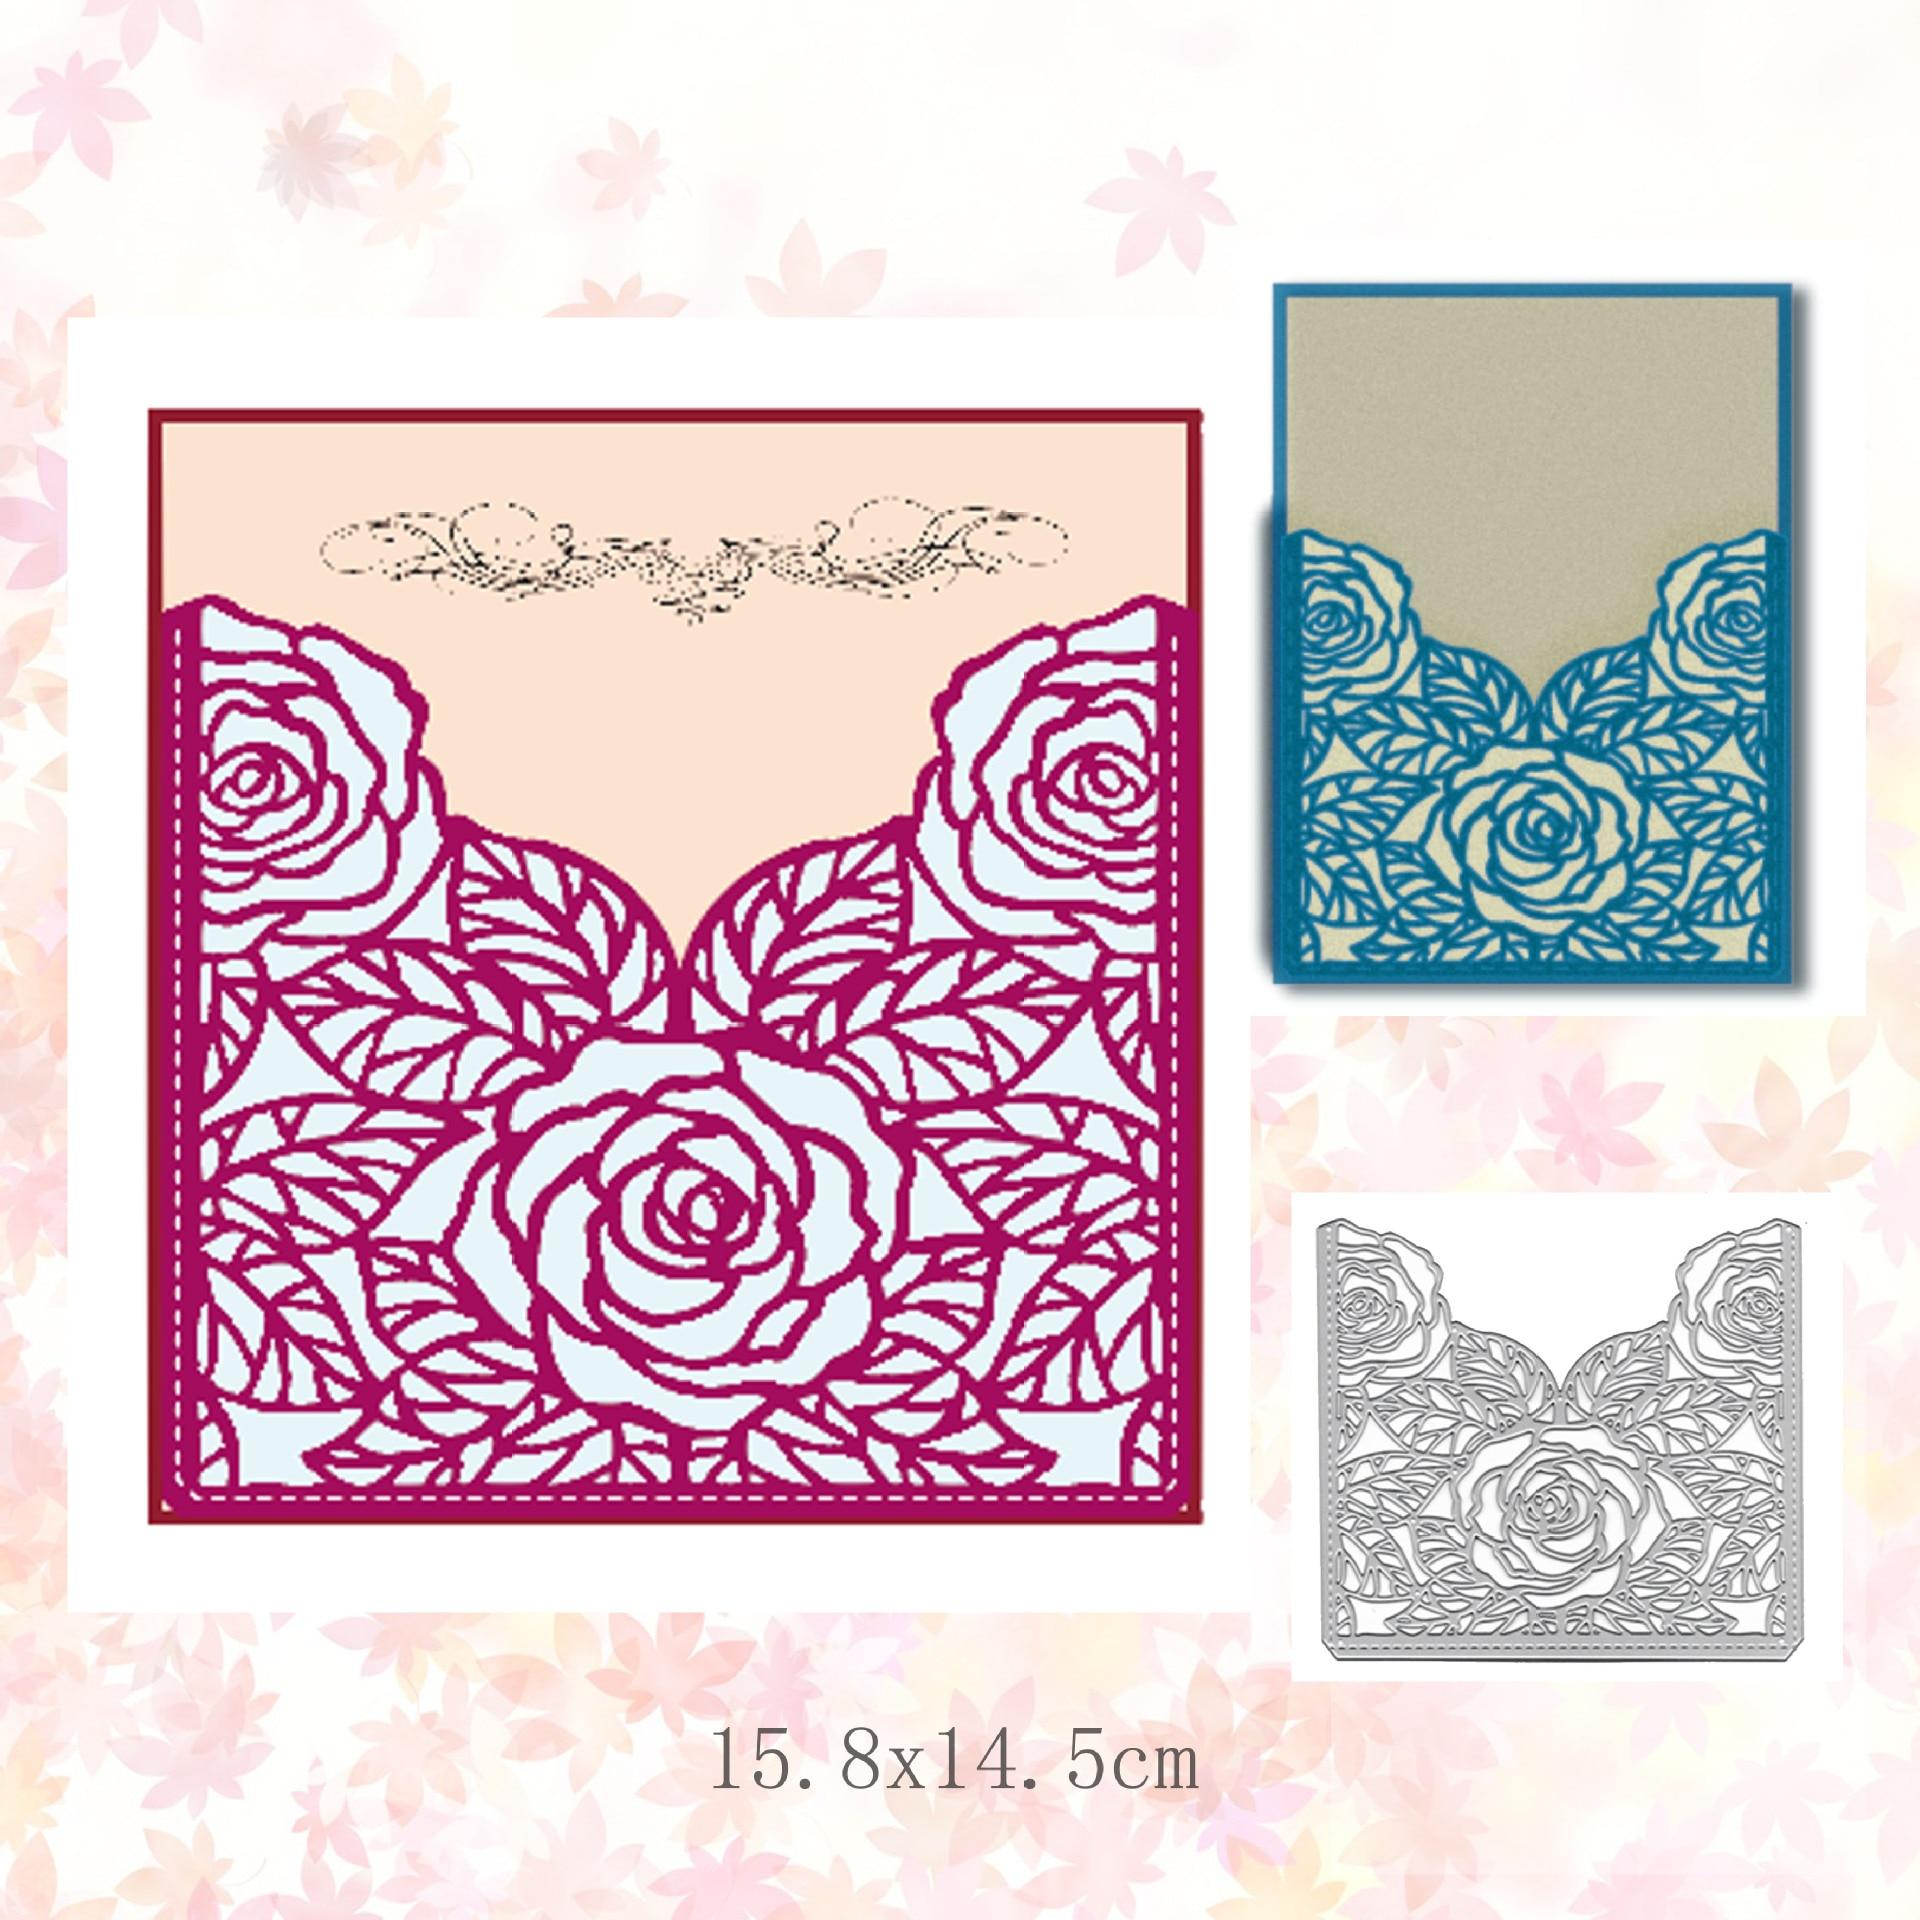 Frame Lace Metal Cutting Dies Stencil Scrapbooking DIY Album Cards Craft Making